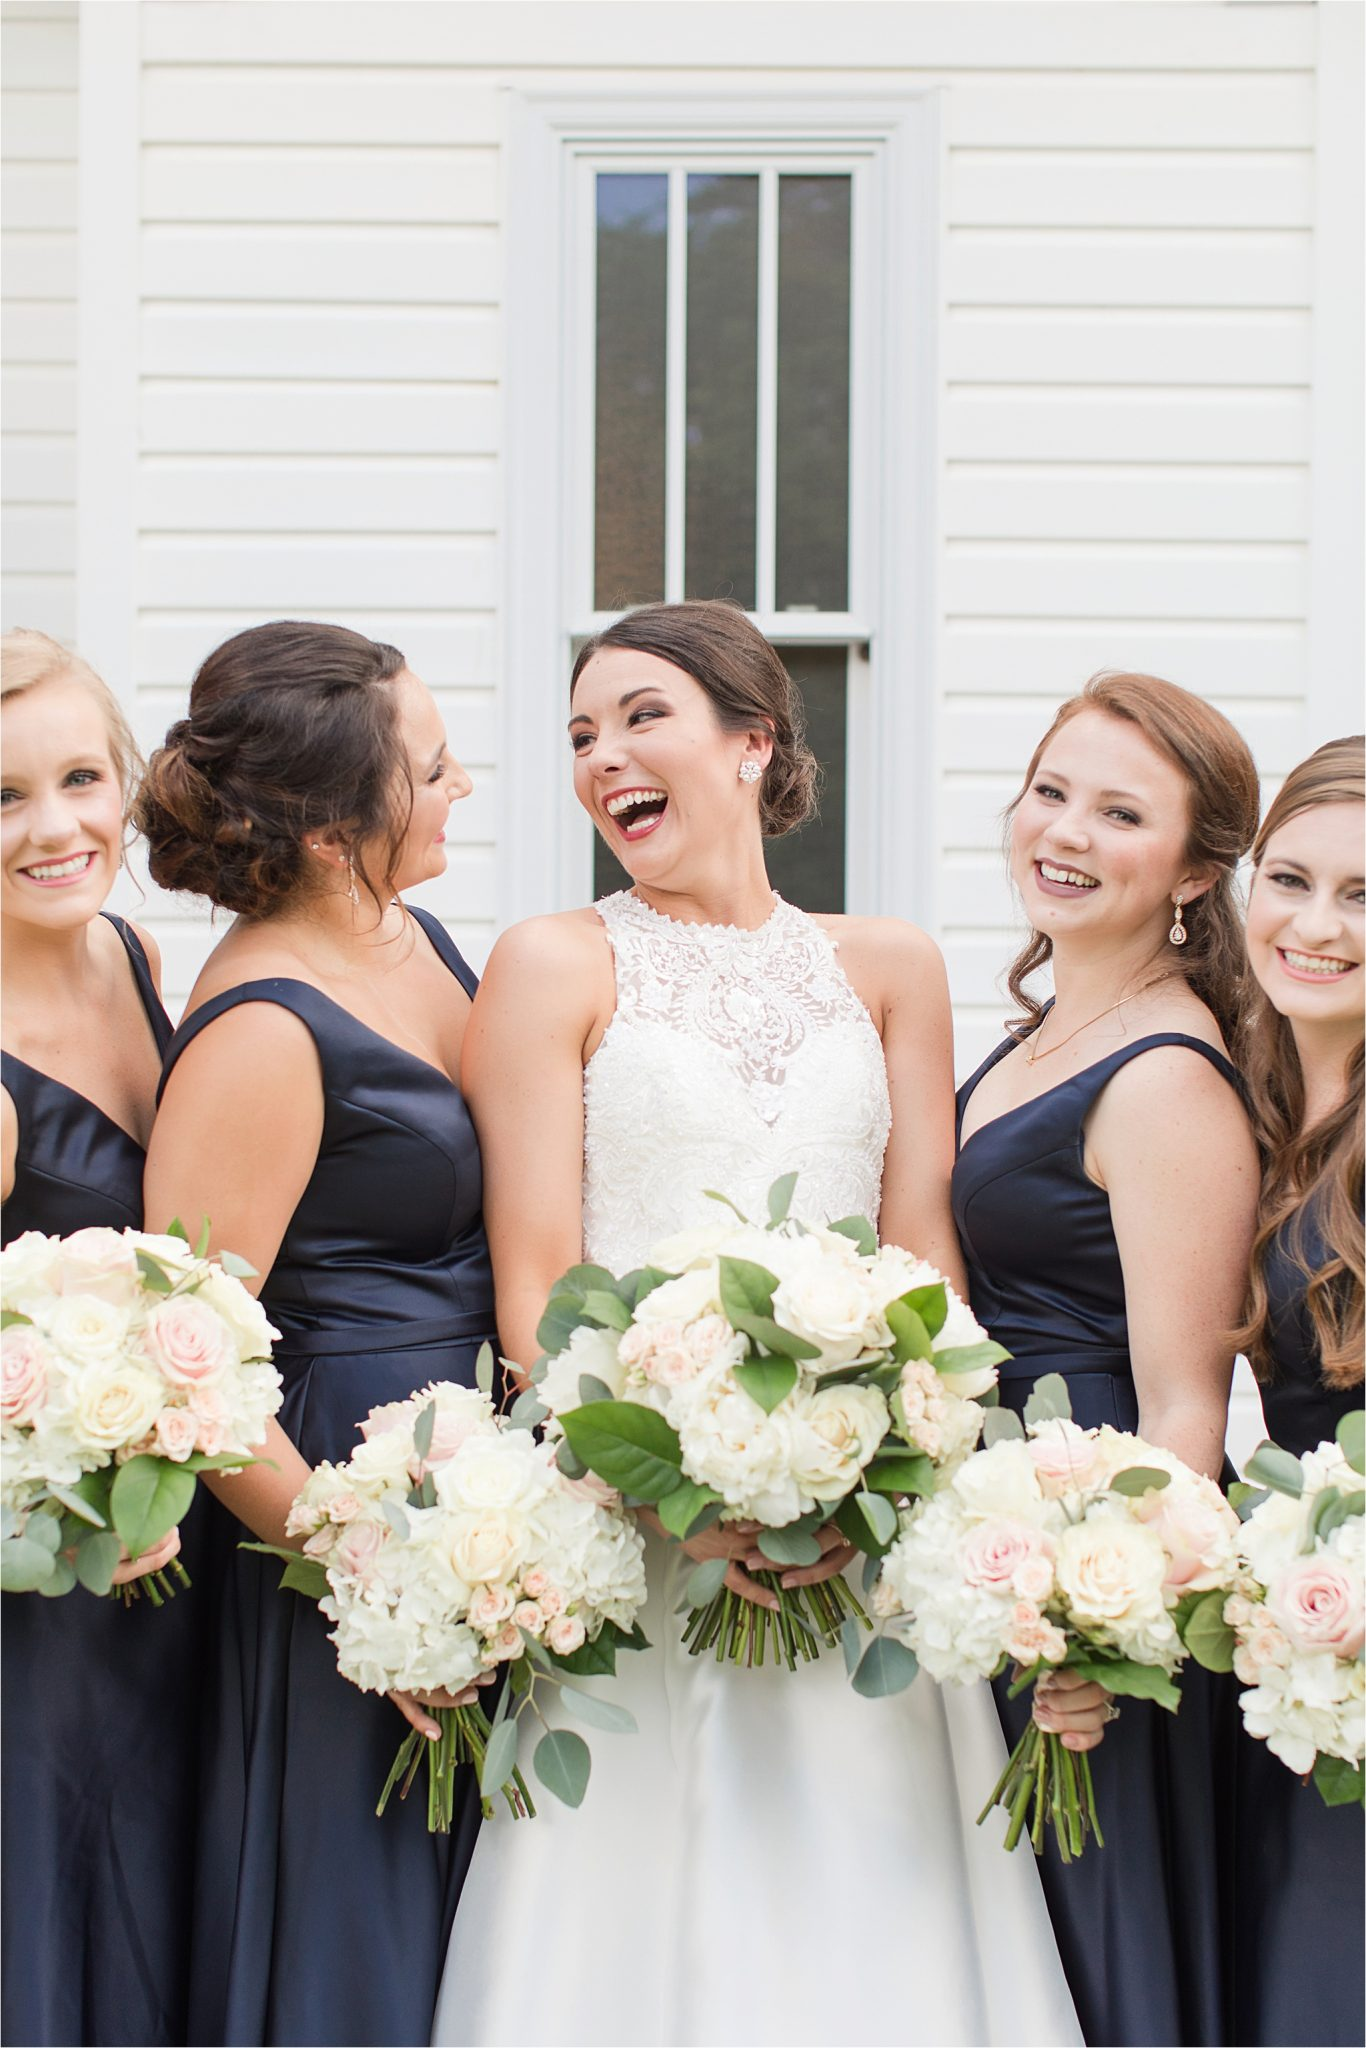 Sonnet House, Birmingham Alabama Wedding Photographer, Bride and bridesmaid, Wedding bouquets